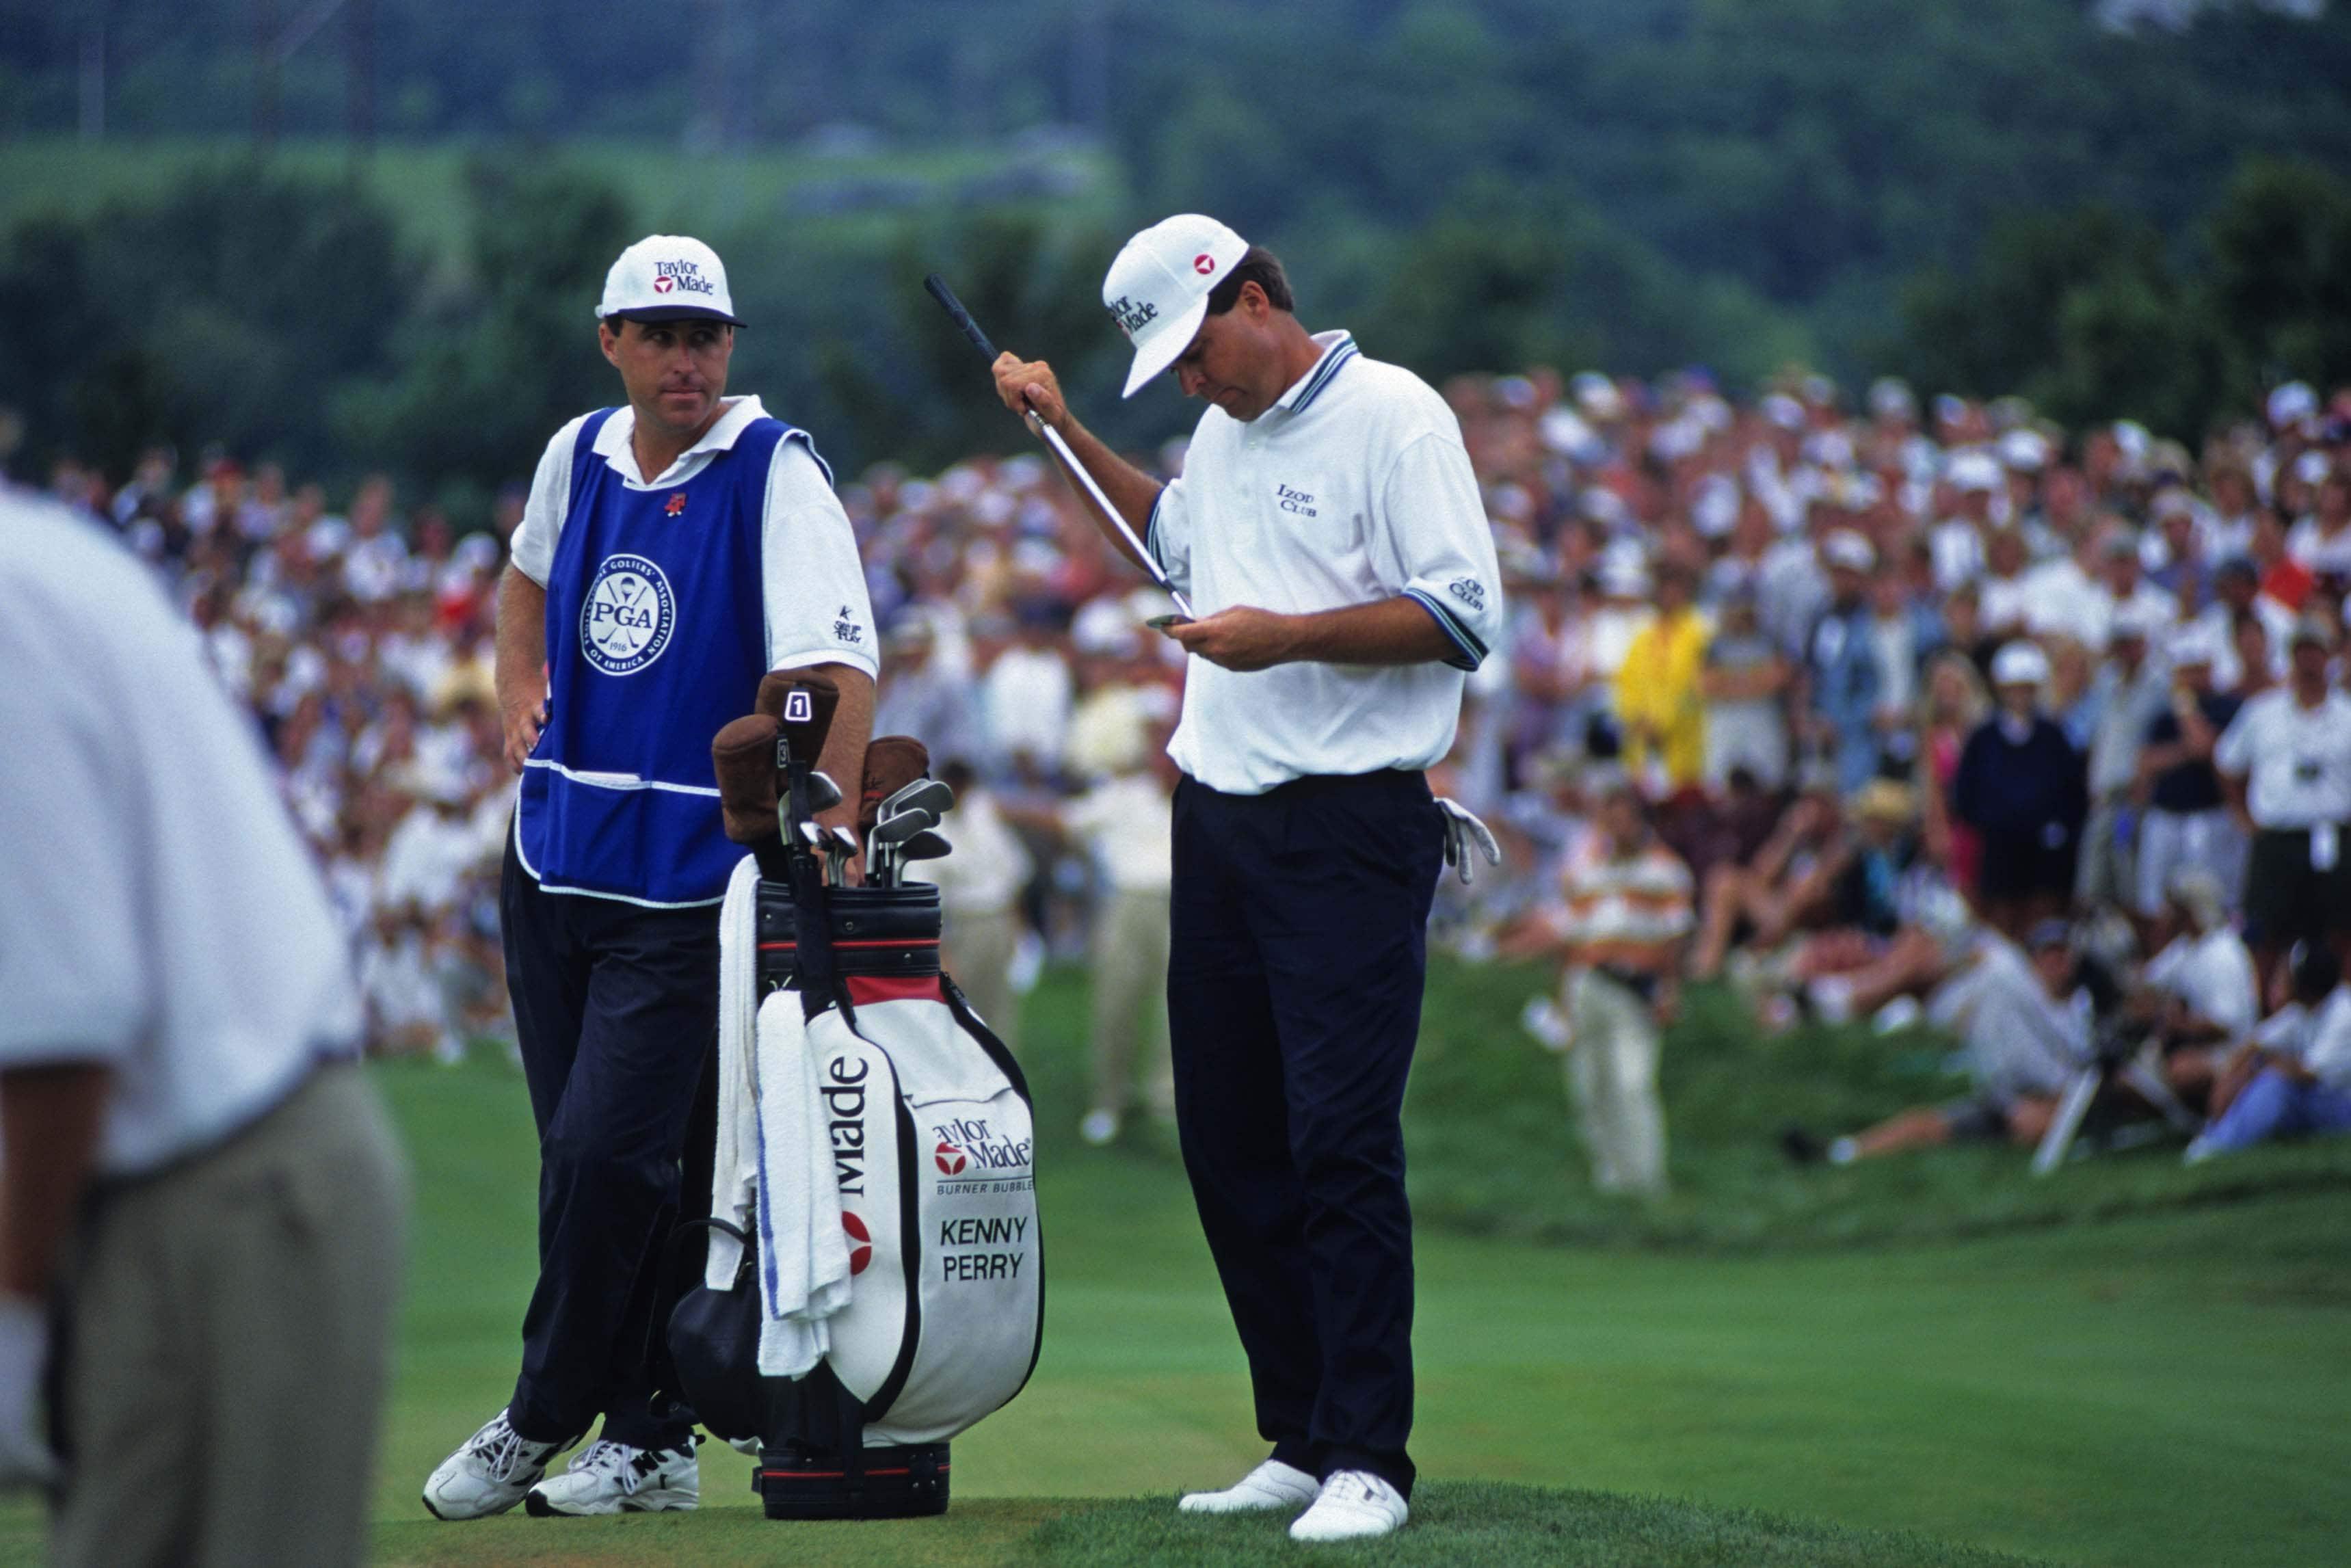 Kenny Perry, 1996 PGA Championship